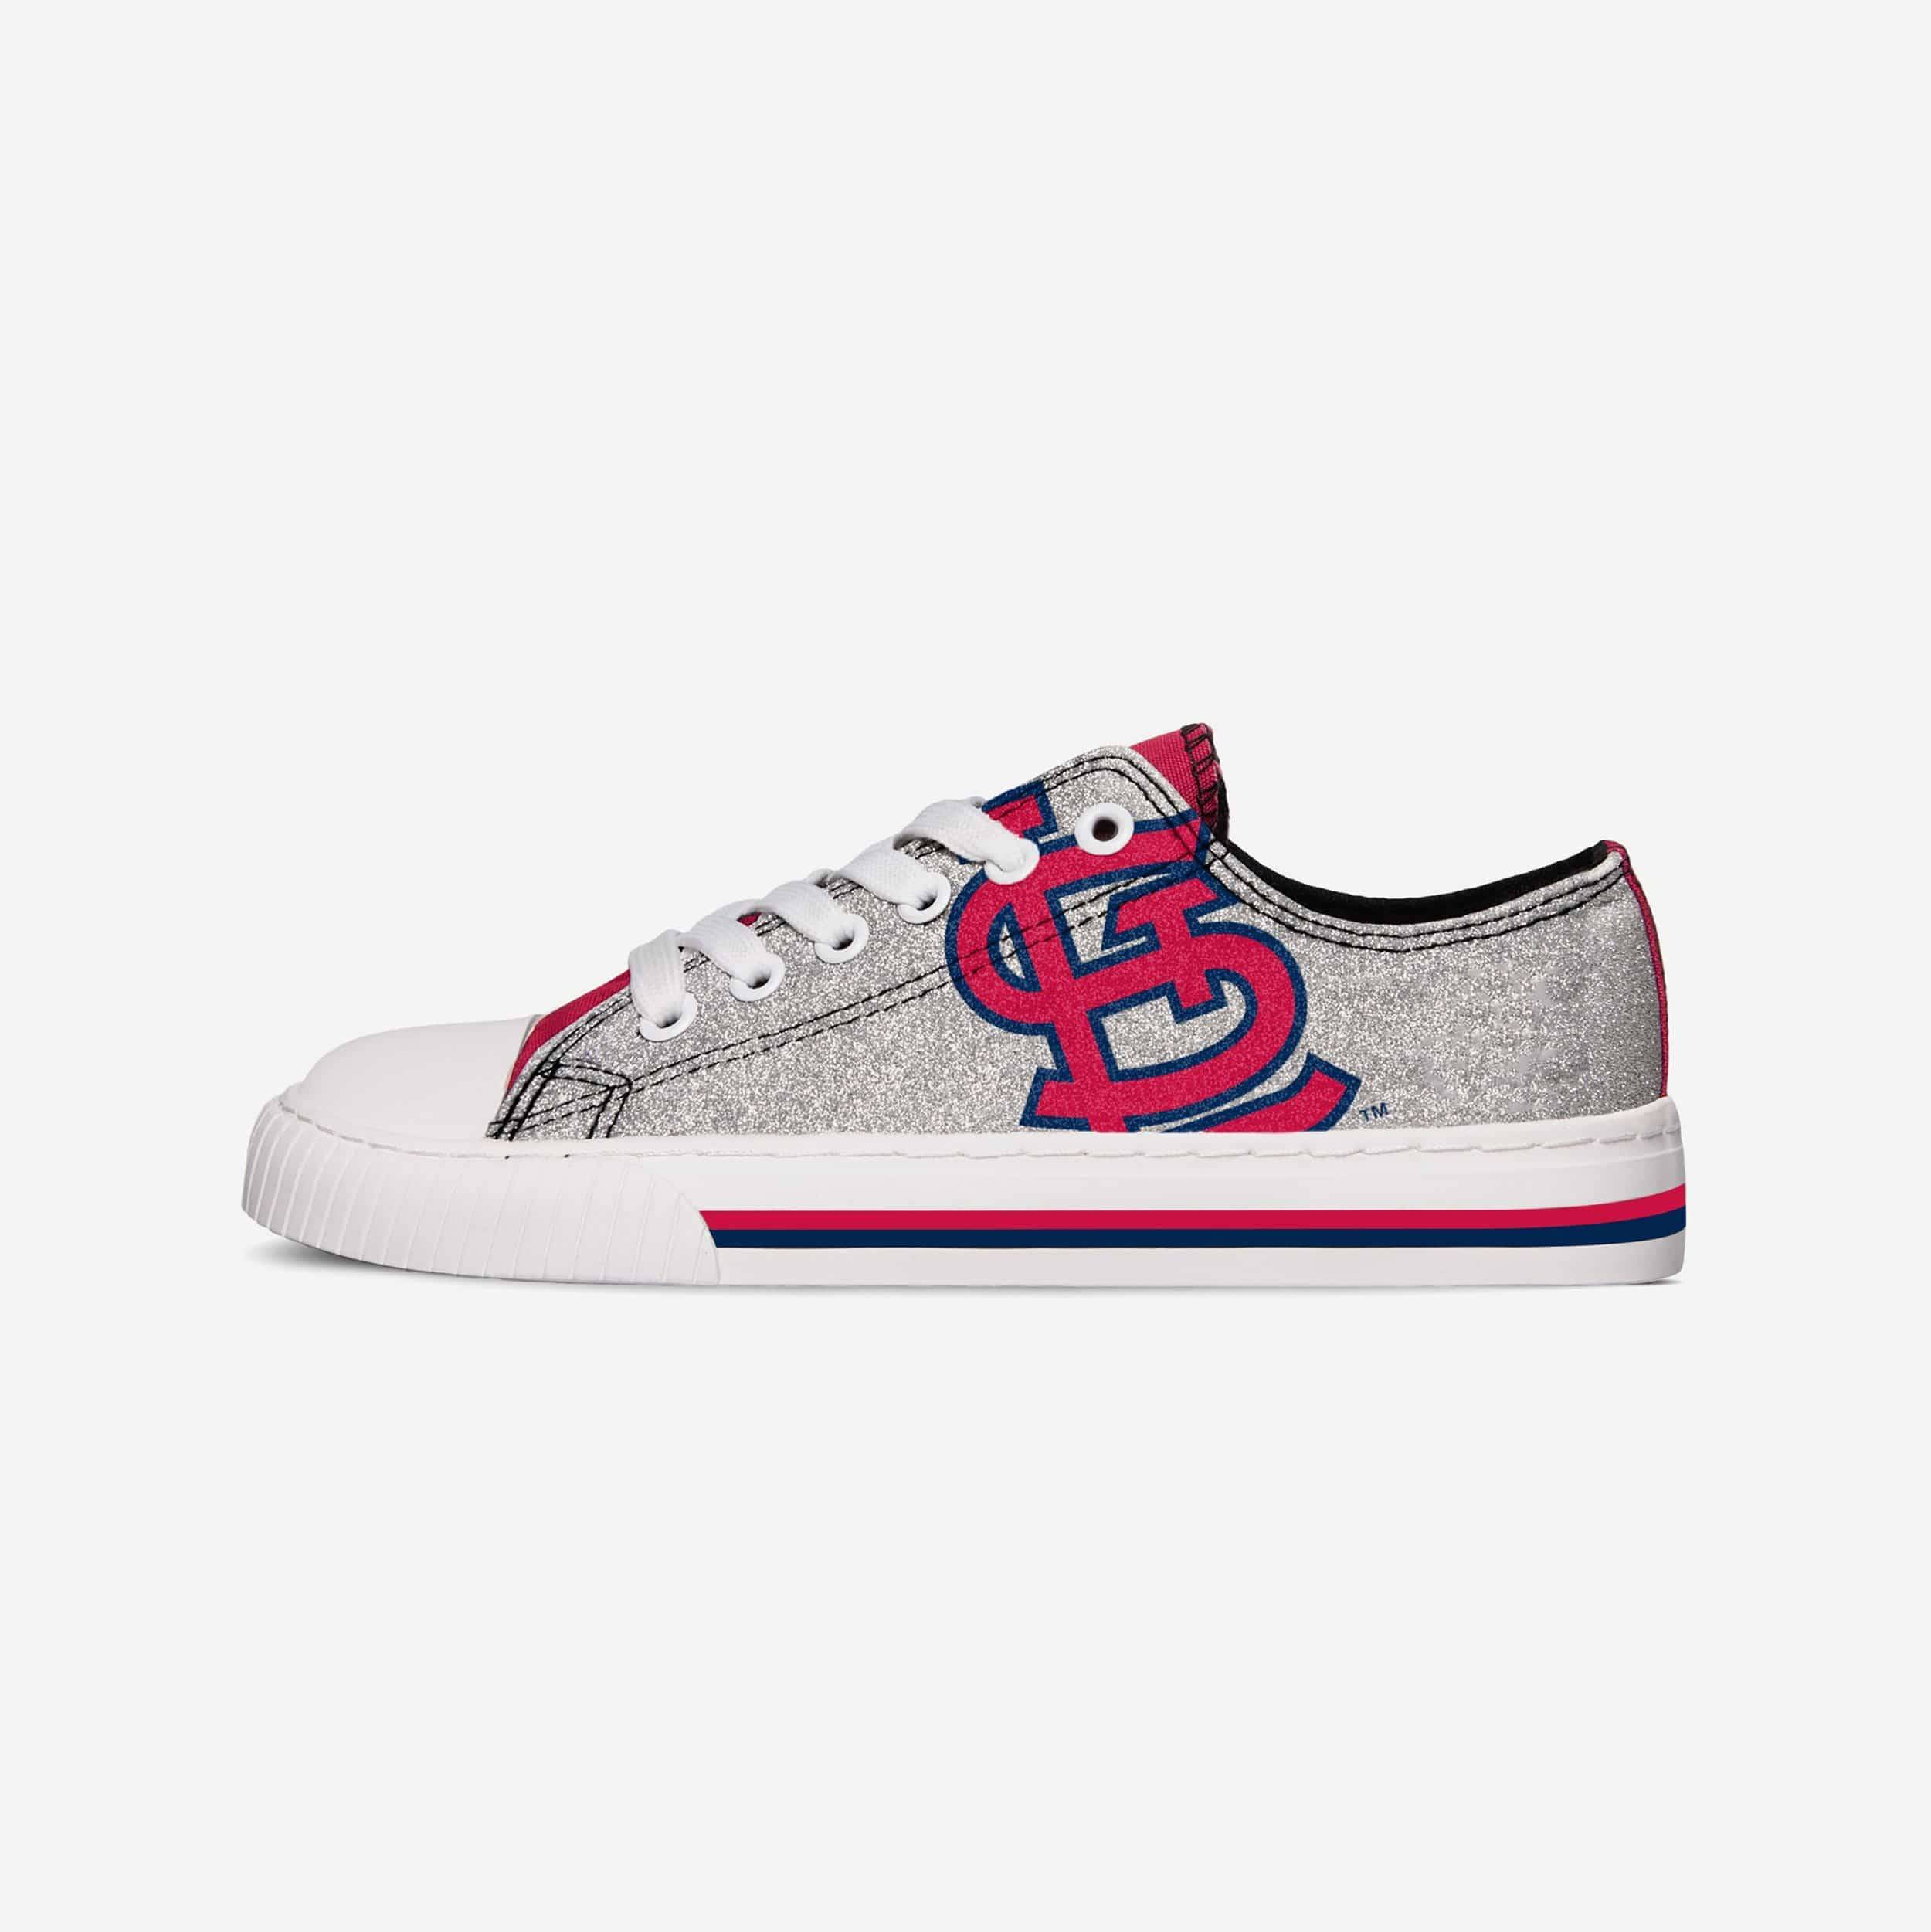 FOCO St Louis Cardinals Womens Glitter Low Top Canvas Shoes - 6